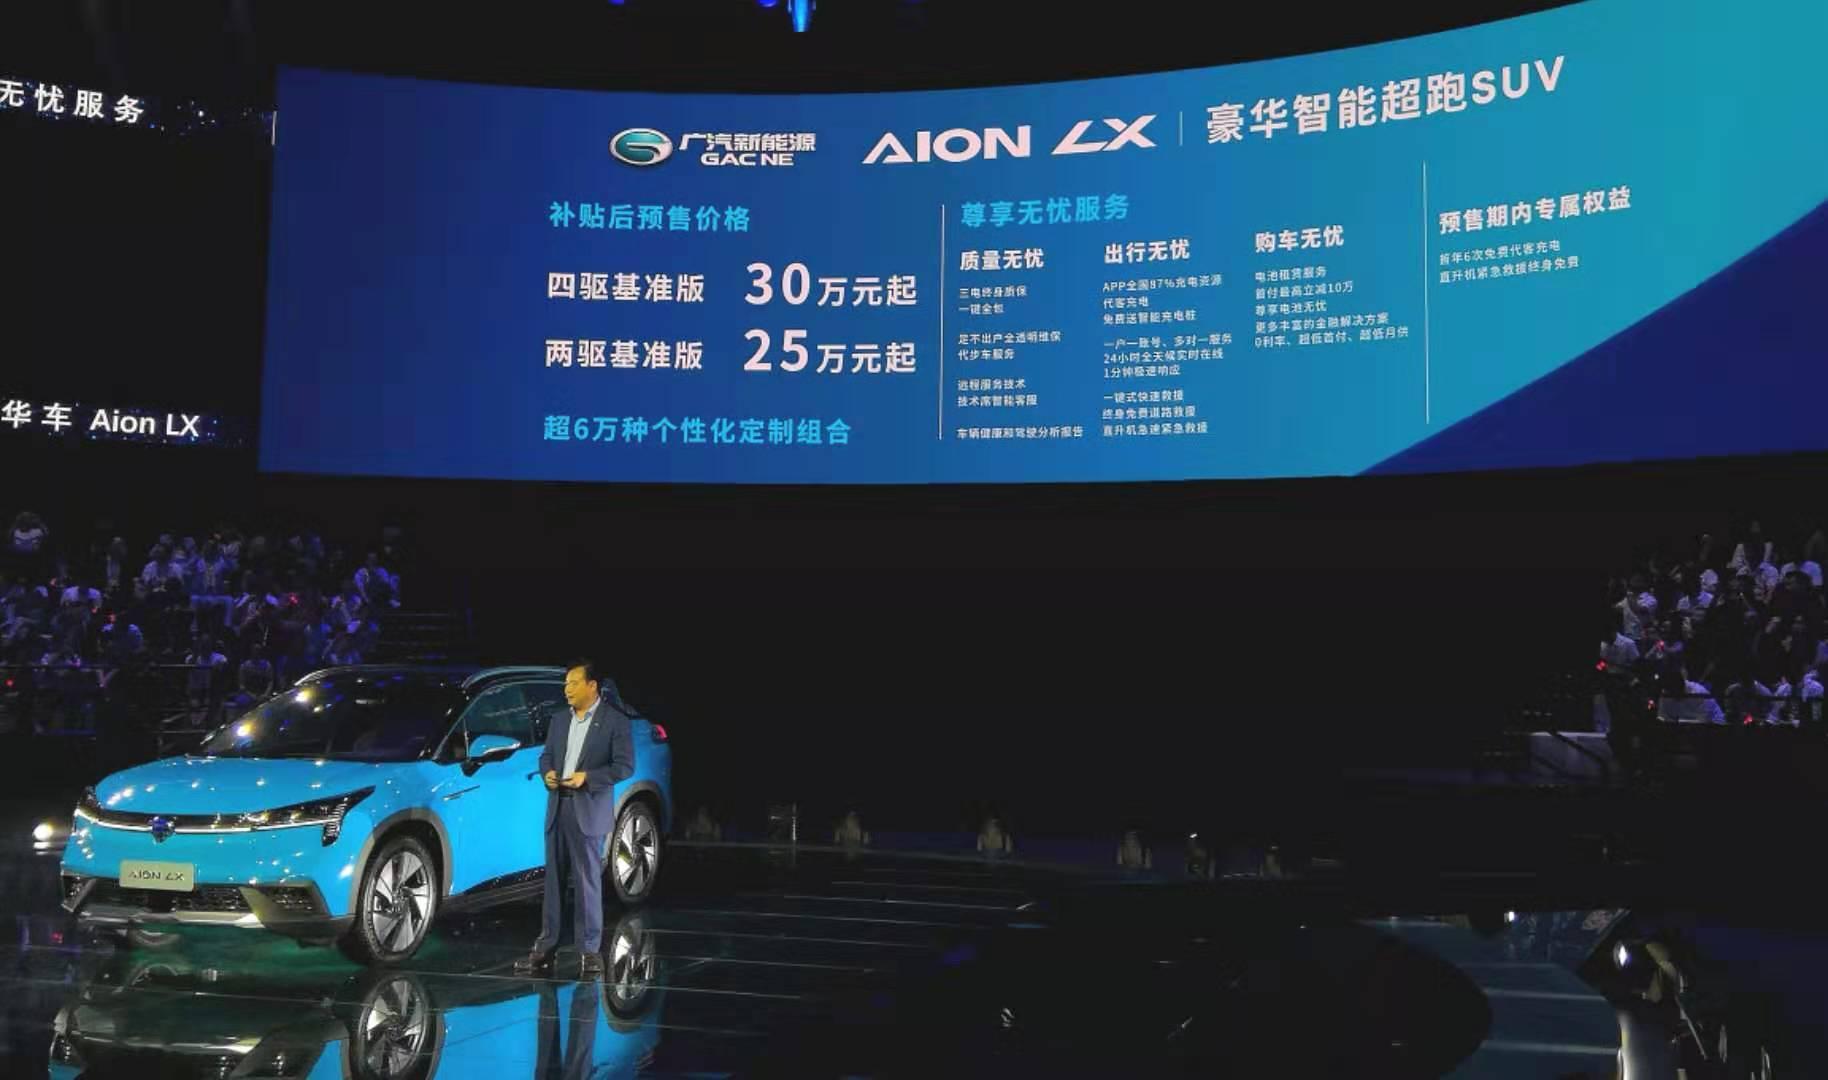 650km续航+L3级自动驾驶!广汽新能源Aion LX预售价25万元起